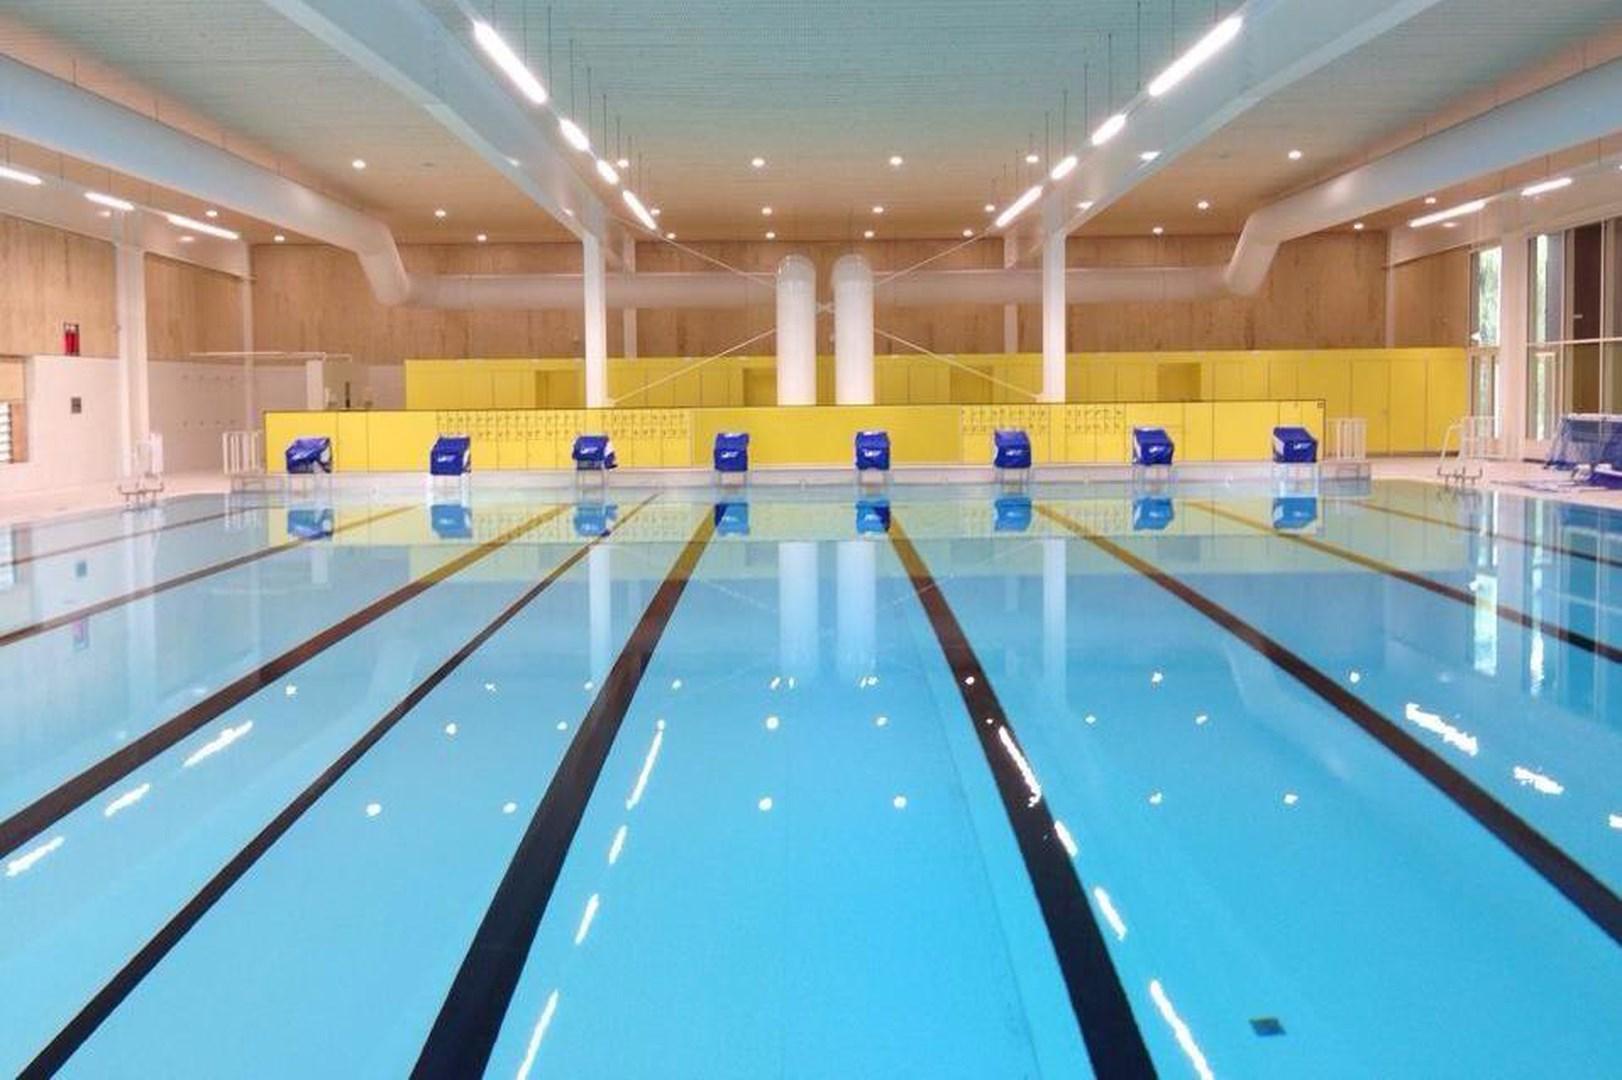 Zwembad coating waterdichte epoxy coating coatings belgi for Zwembad belgie